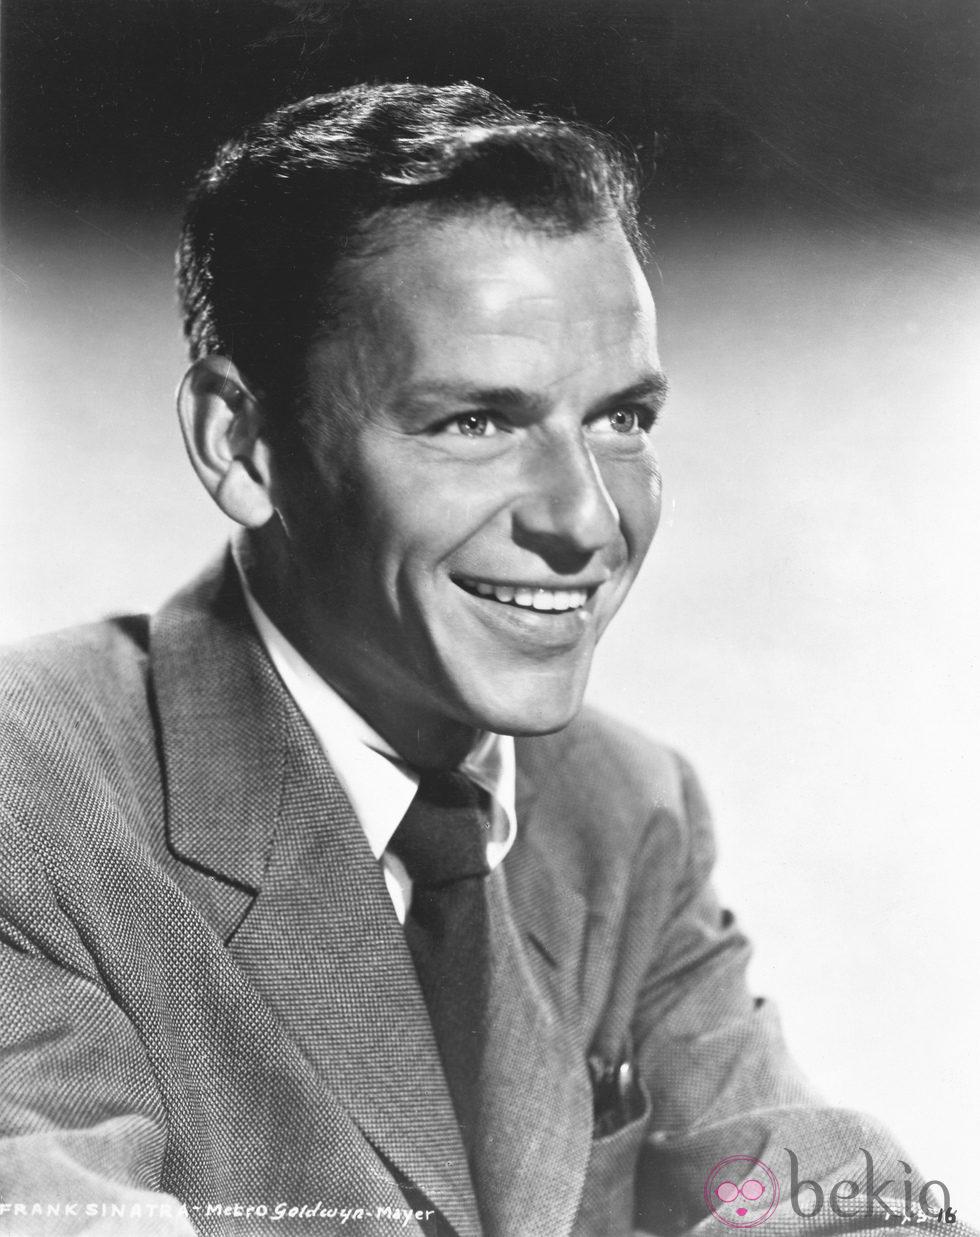 Frank Sinatra, una joven estrella de la música